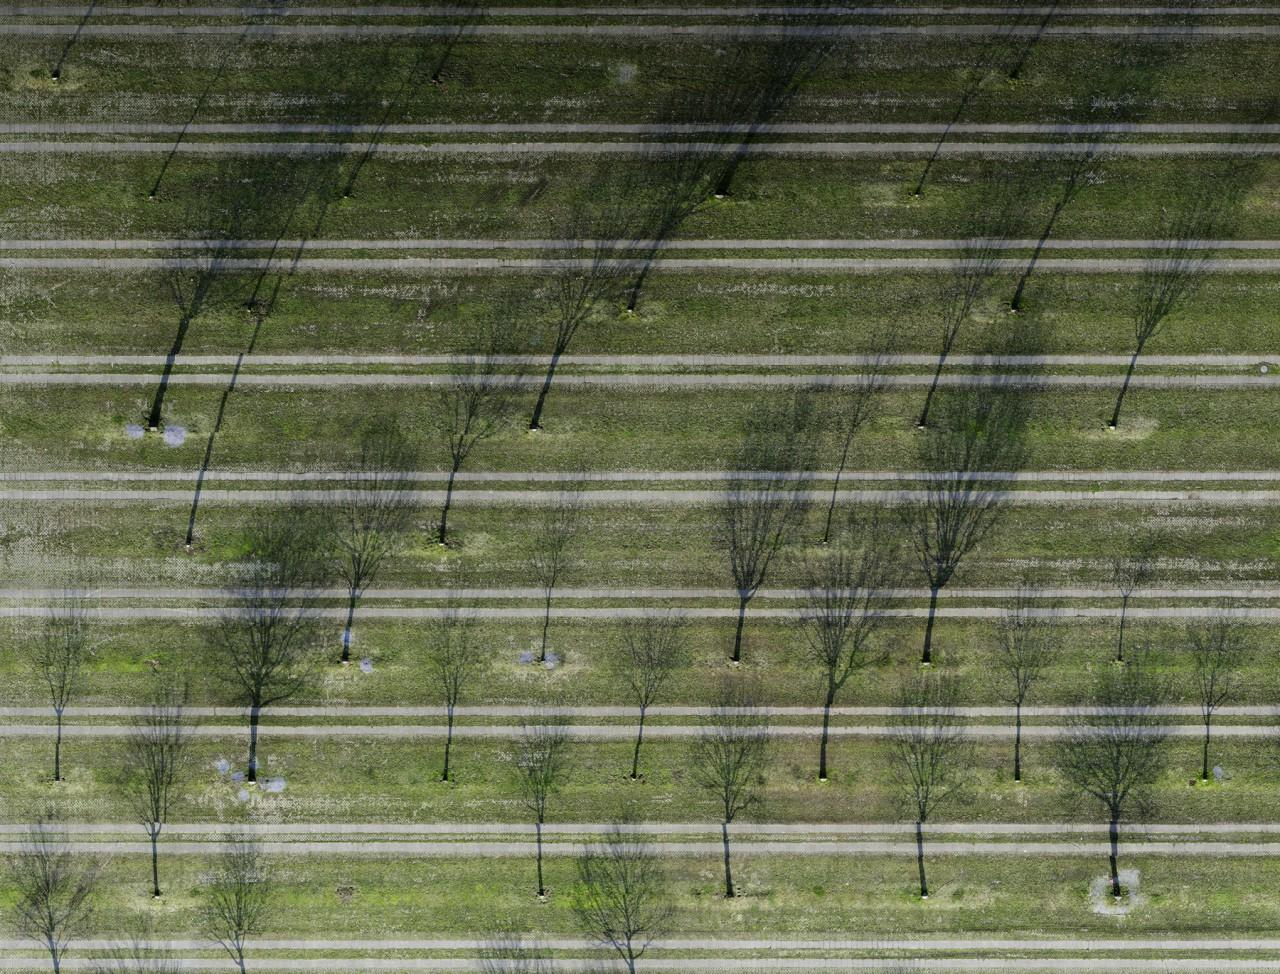 Supervisions - Ohne Titel (Parkplatz) | Düsseldorf 2007 | Lightjet print | 170 x 223 cm